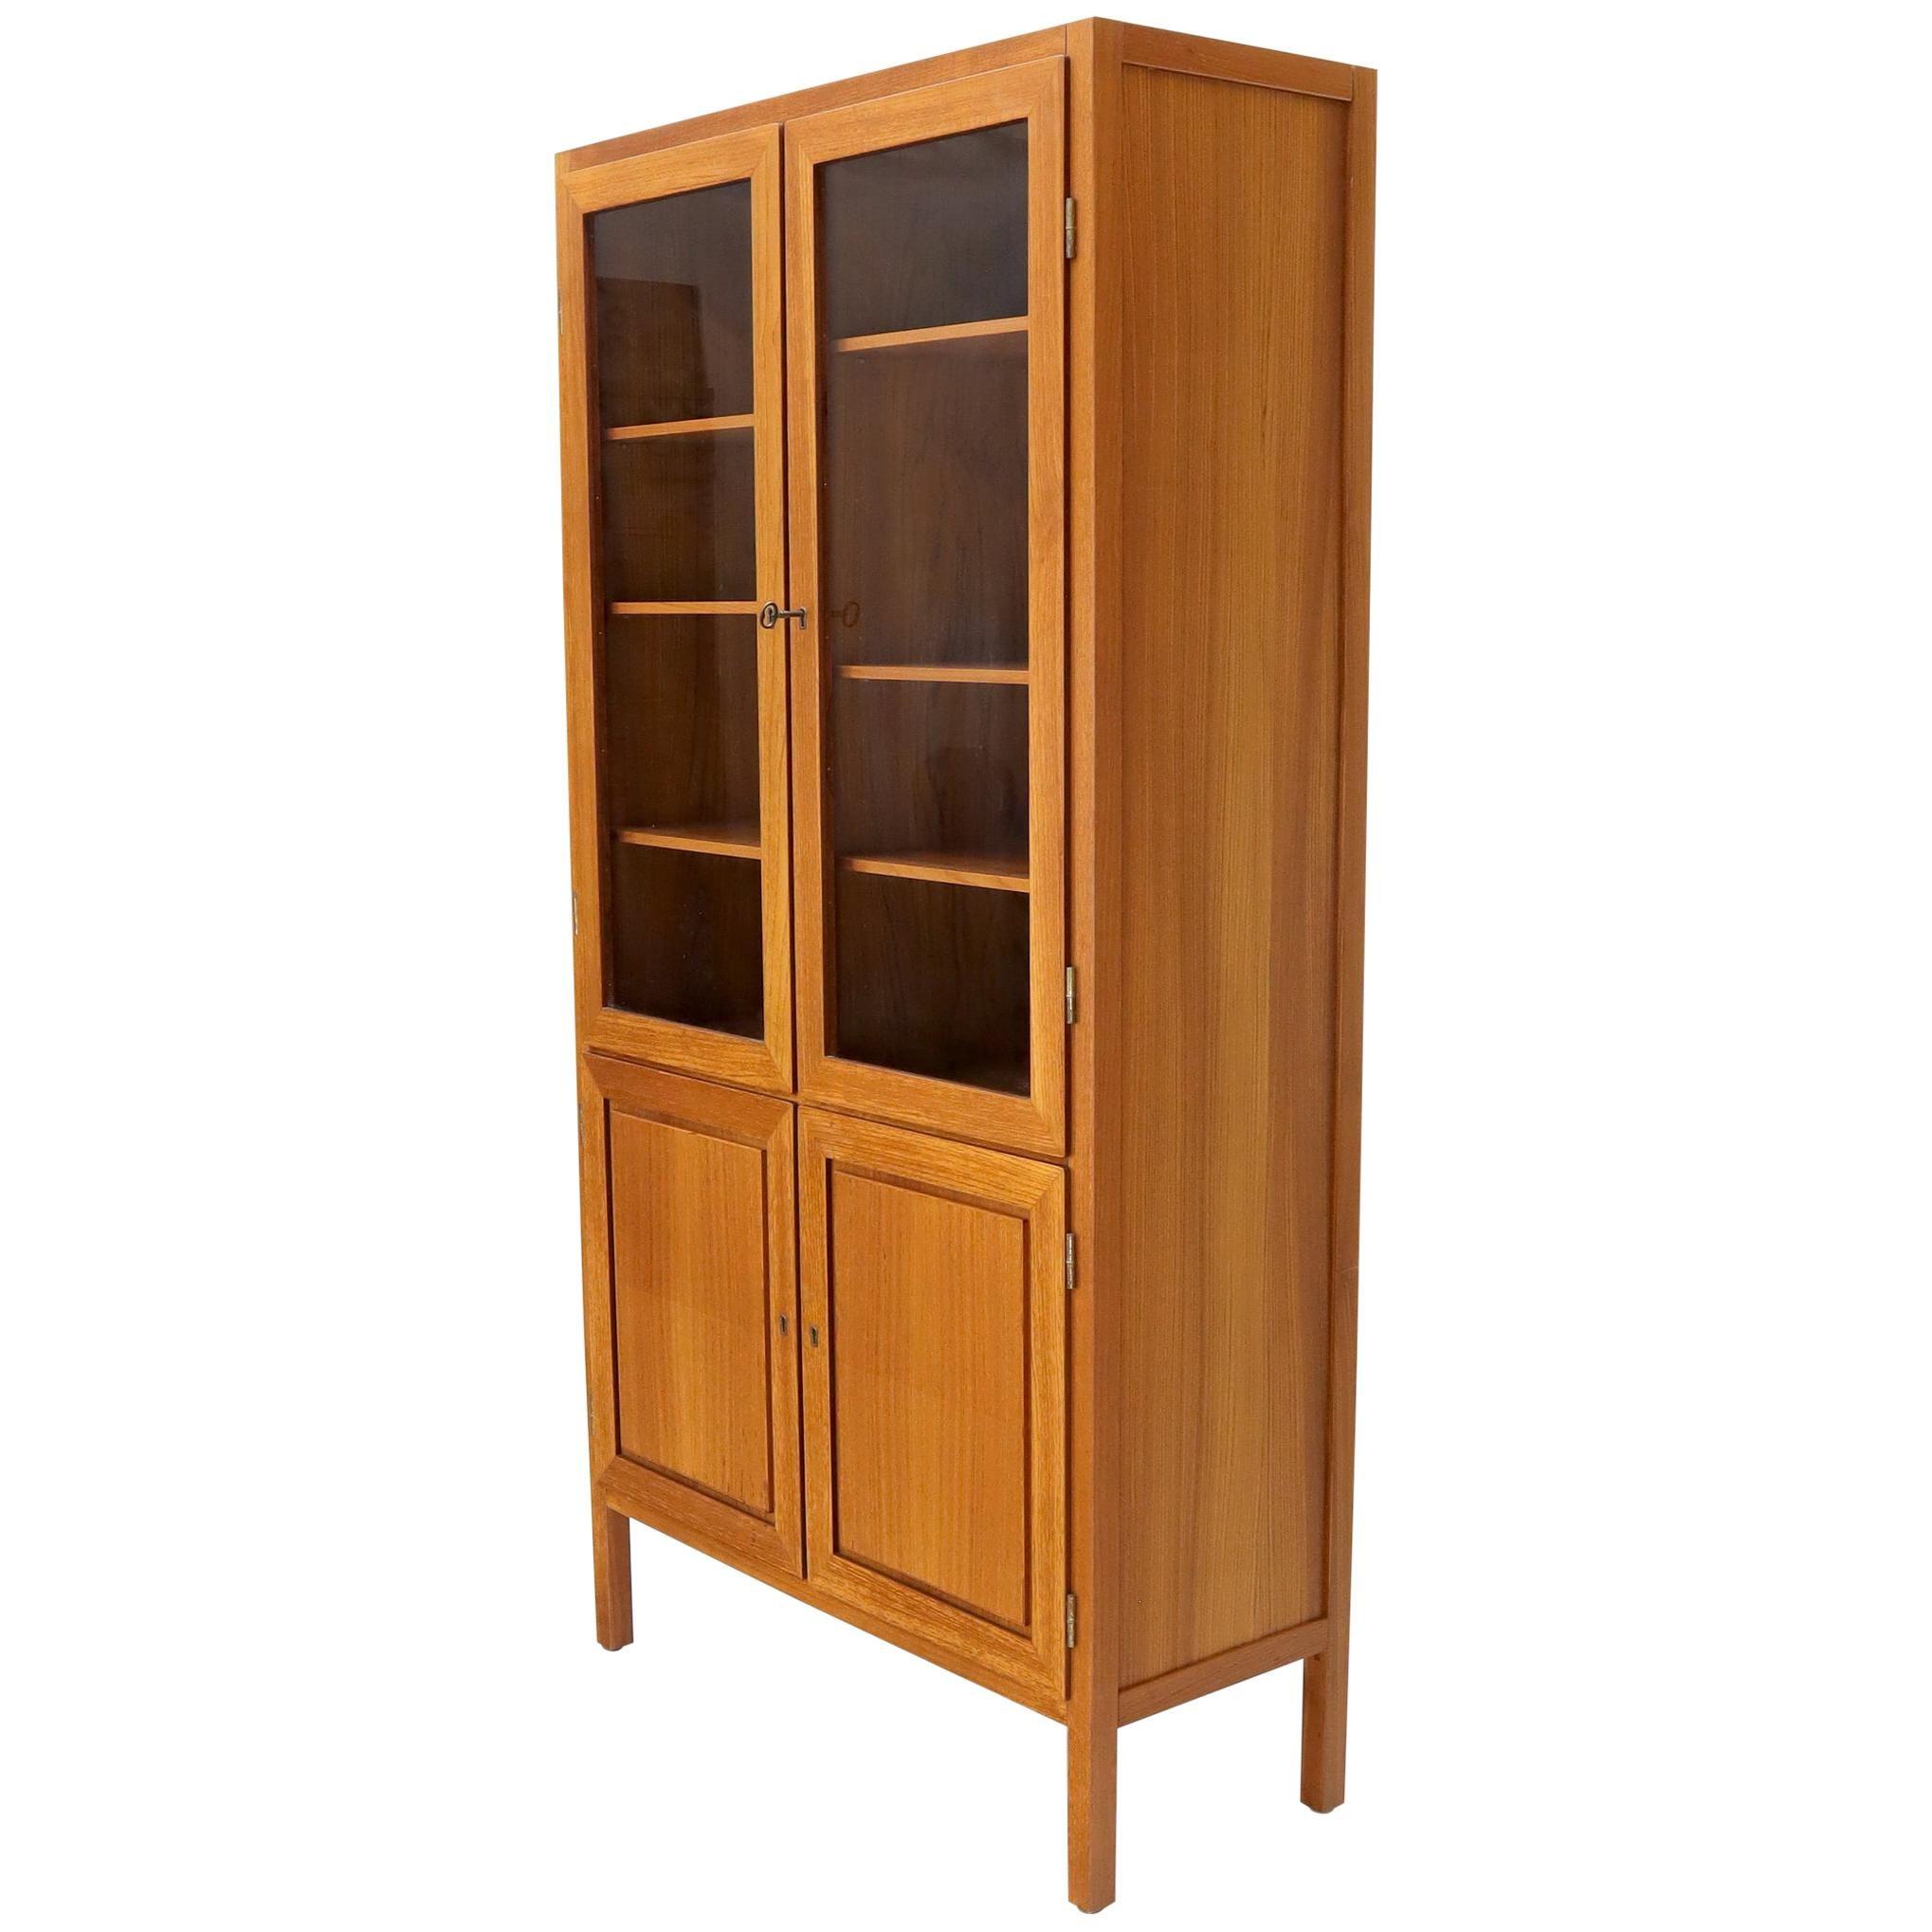 Raised Panel Teak and Glass Doors Danish Mid-Century Modern Cupboard Cabinet